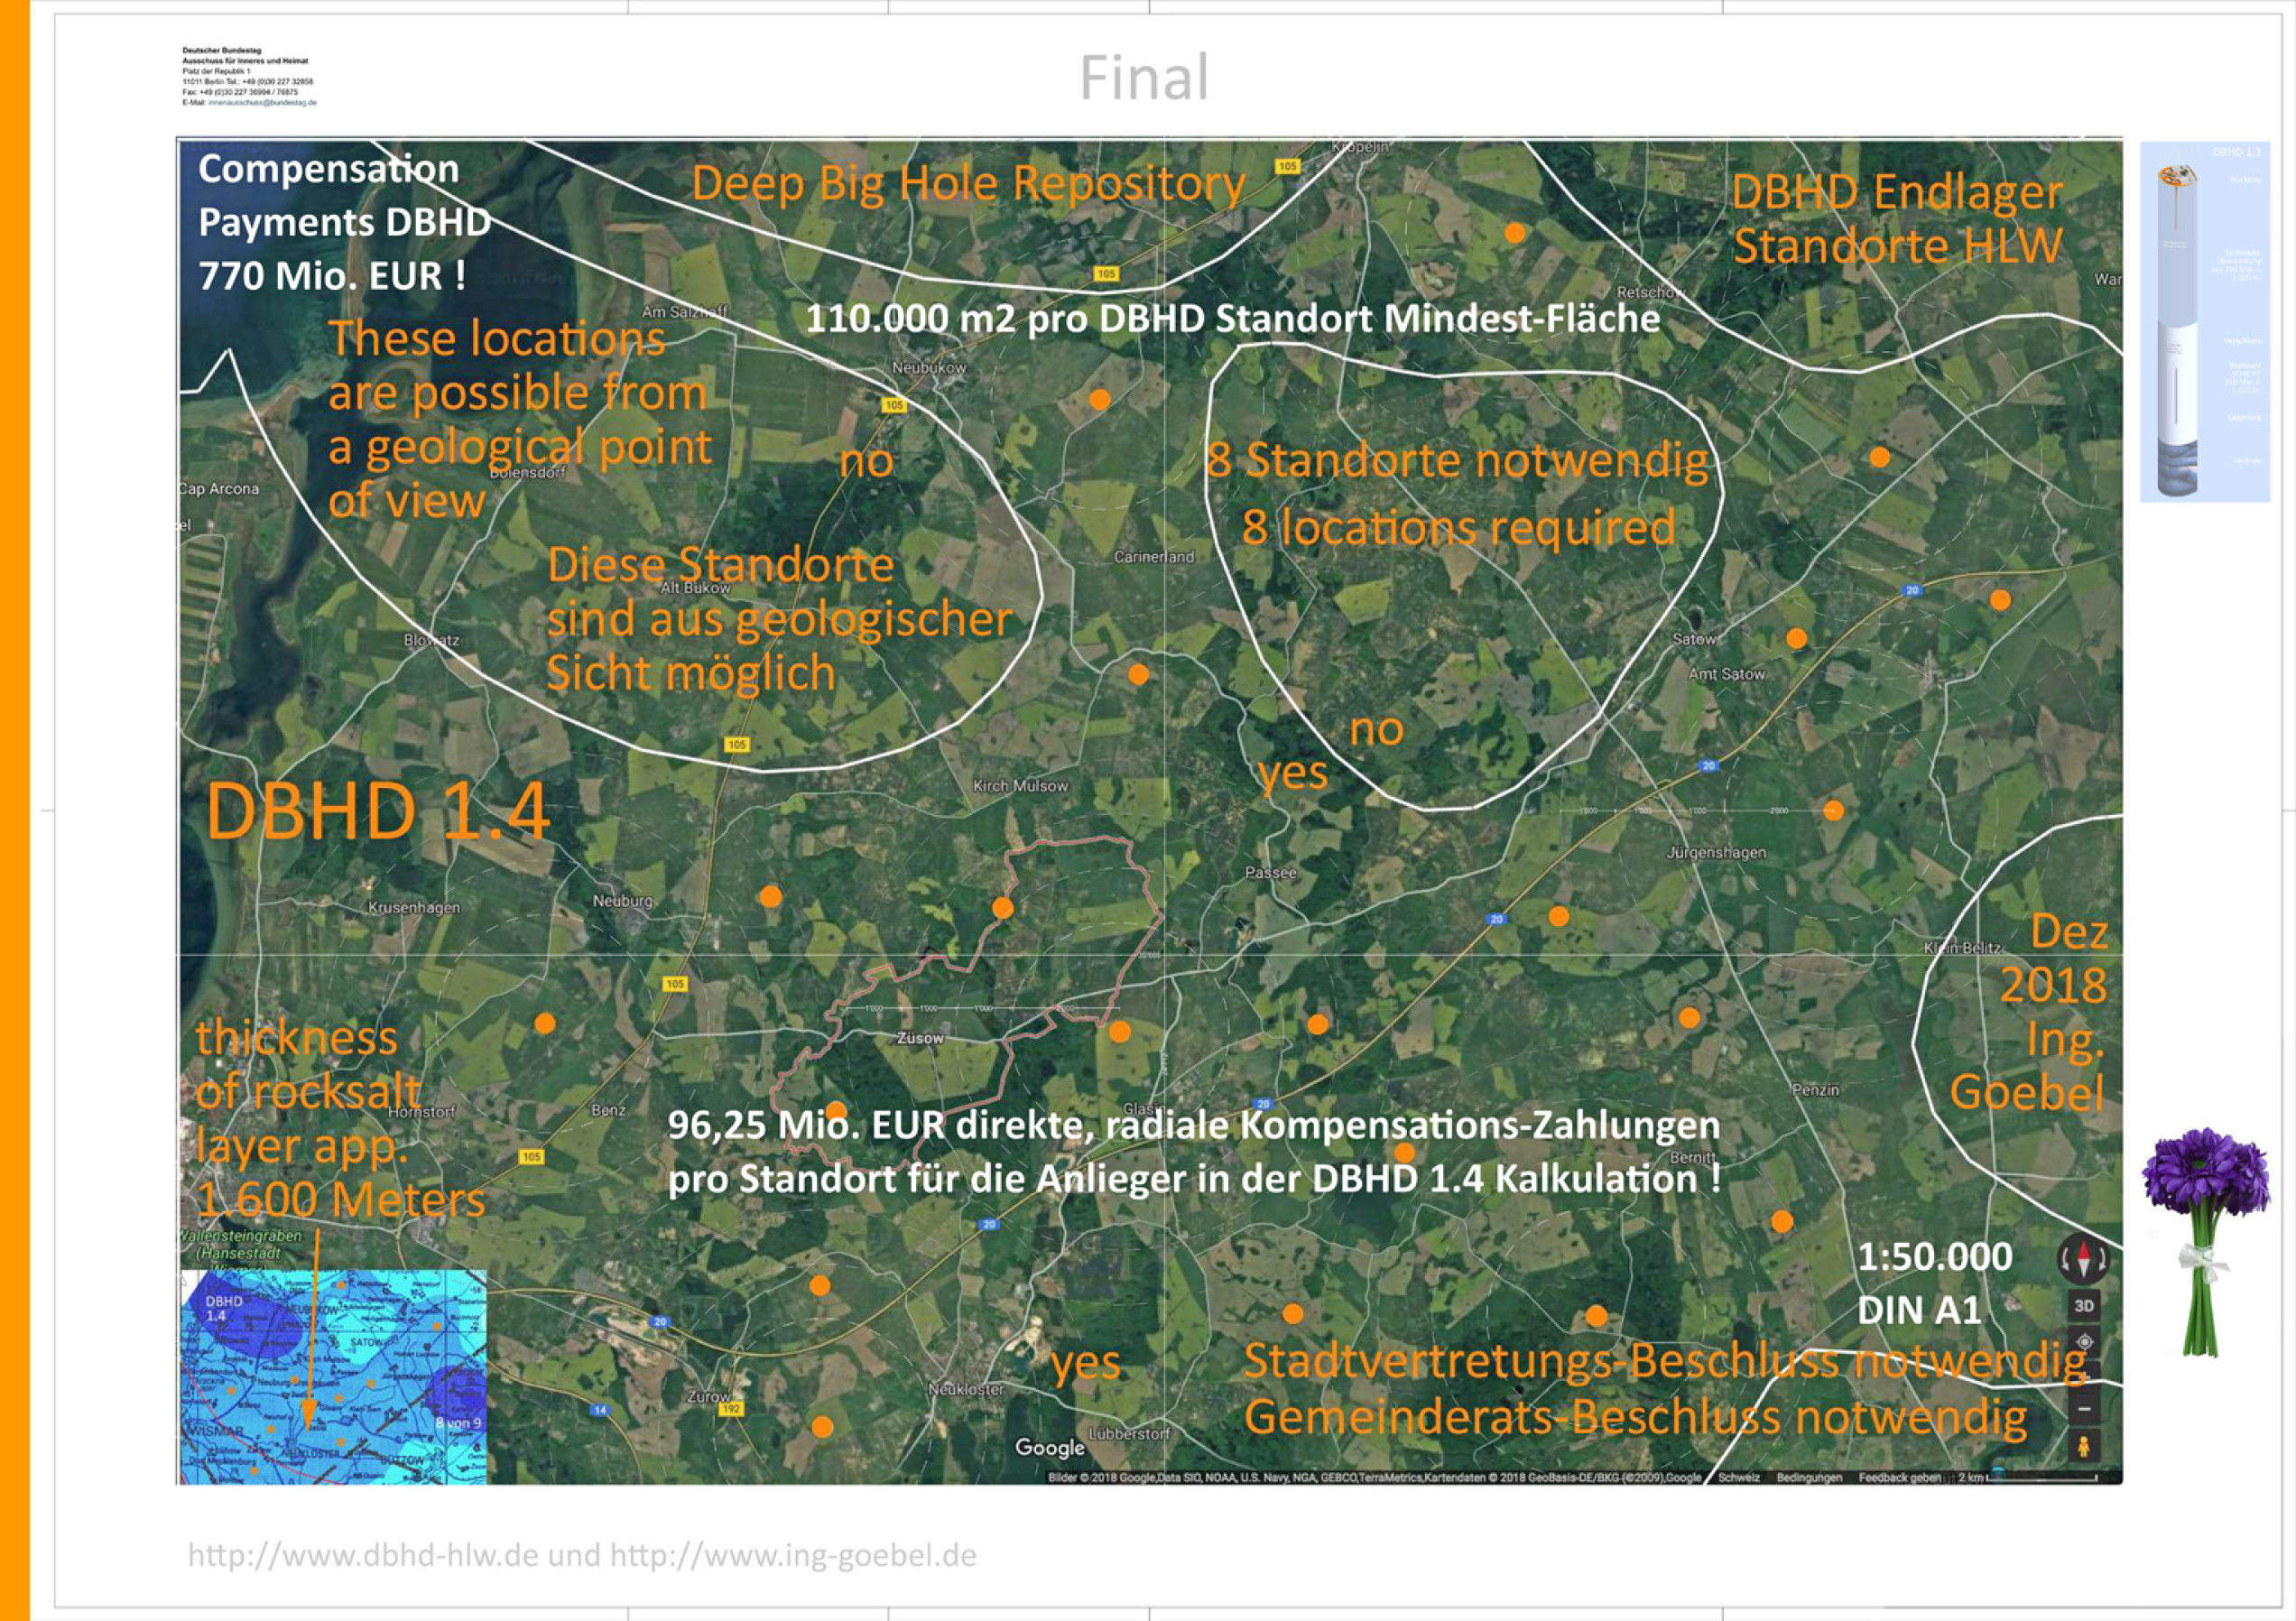 DBHD_1.4_Endlager_Standorte_Kompensationsradien_Karte_ing_Goebel_Basis_Geologische_Karte_auf_Satellitenbild Volker Goebel Endlager